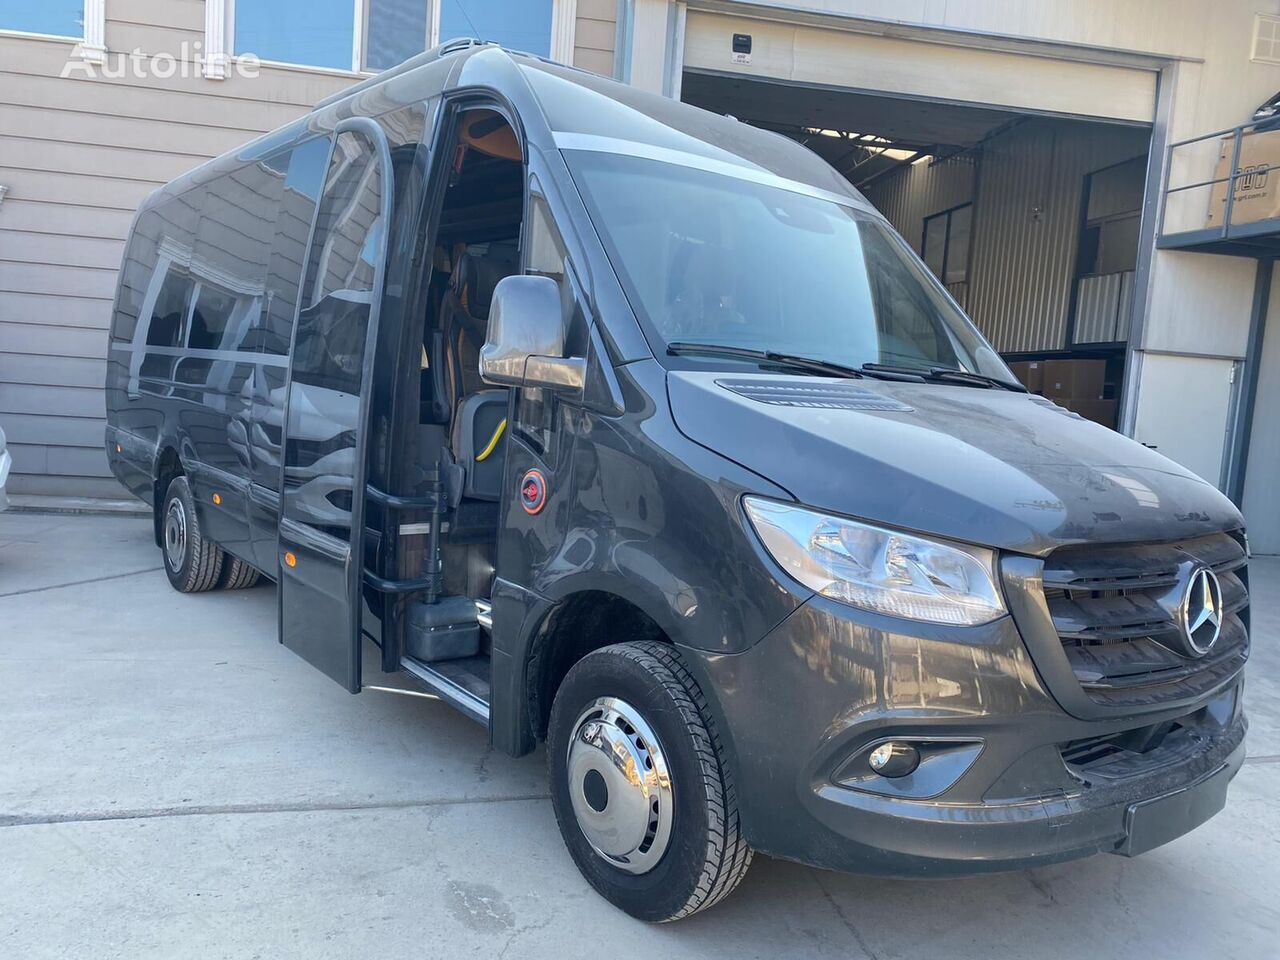 new MERCEDES-BENZ Sprinter 519 Bavaria Panorama Shutlle, New vehicle, COC passenger van